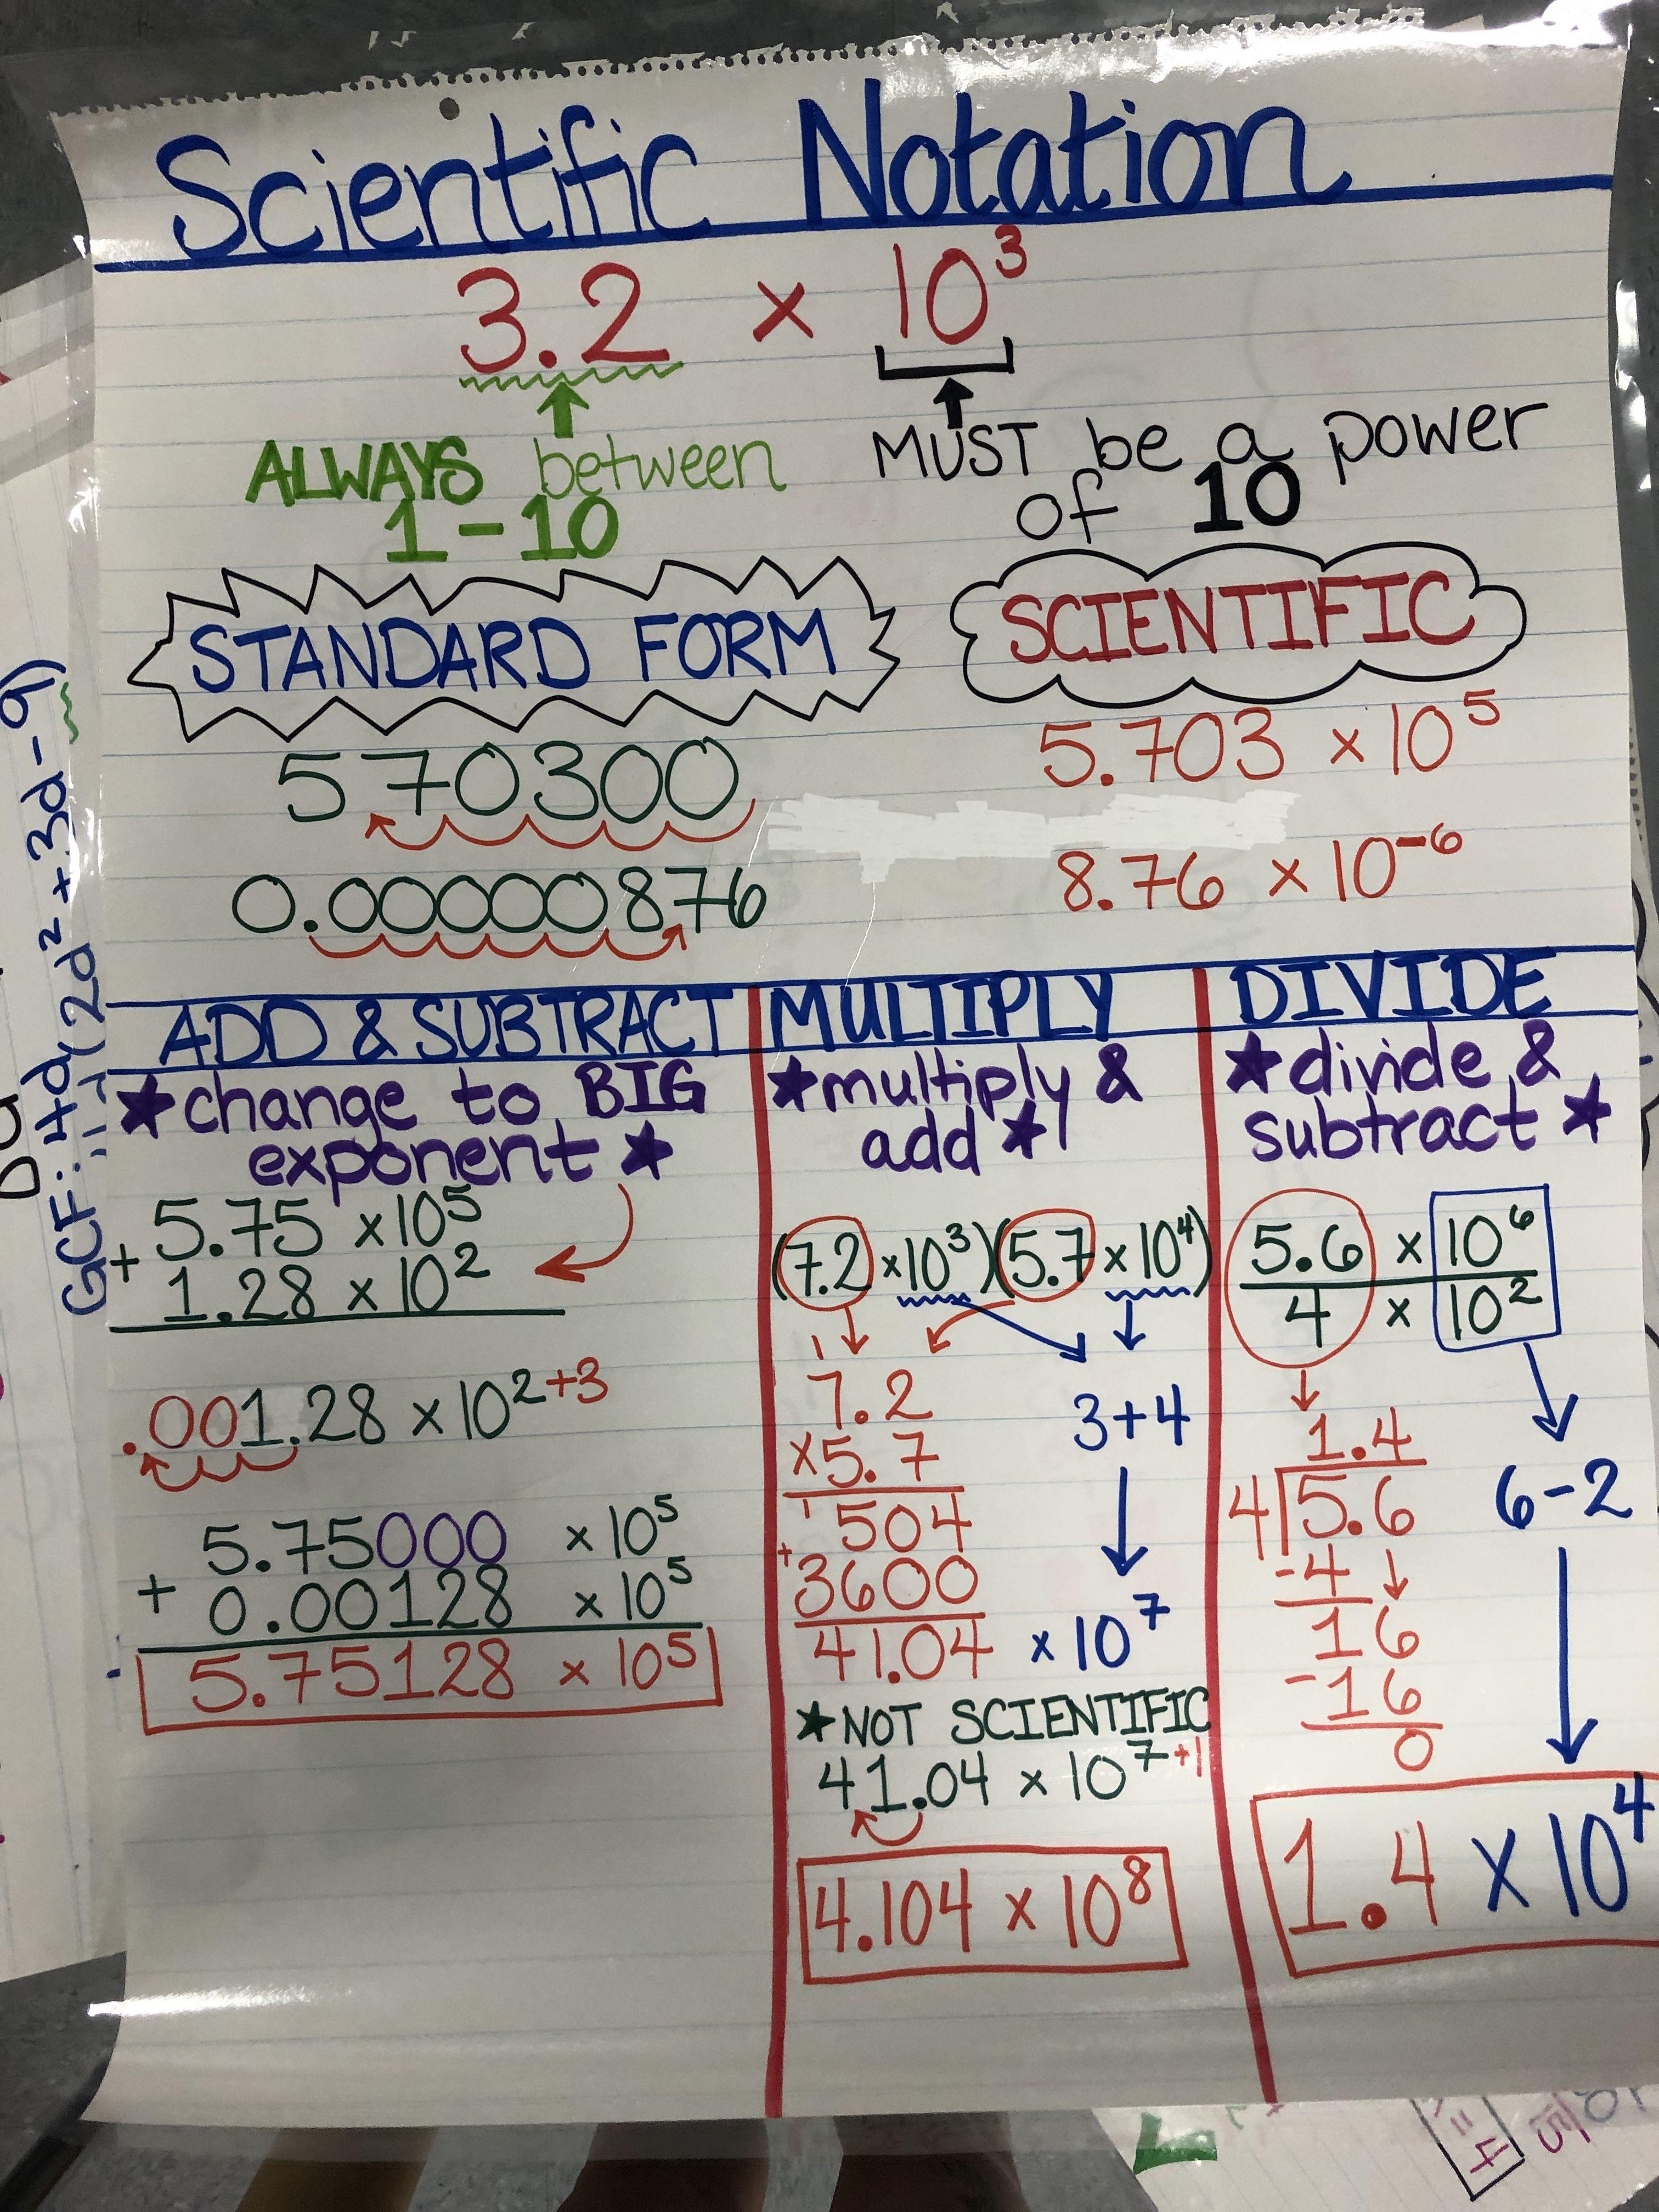 Scientific Notation Scientific Notation Notes Math Lessons Middle School Scientific Notation [ 4032 x 3024 Pixel ]